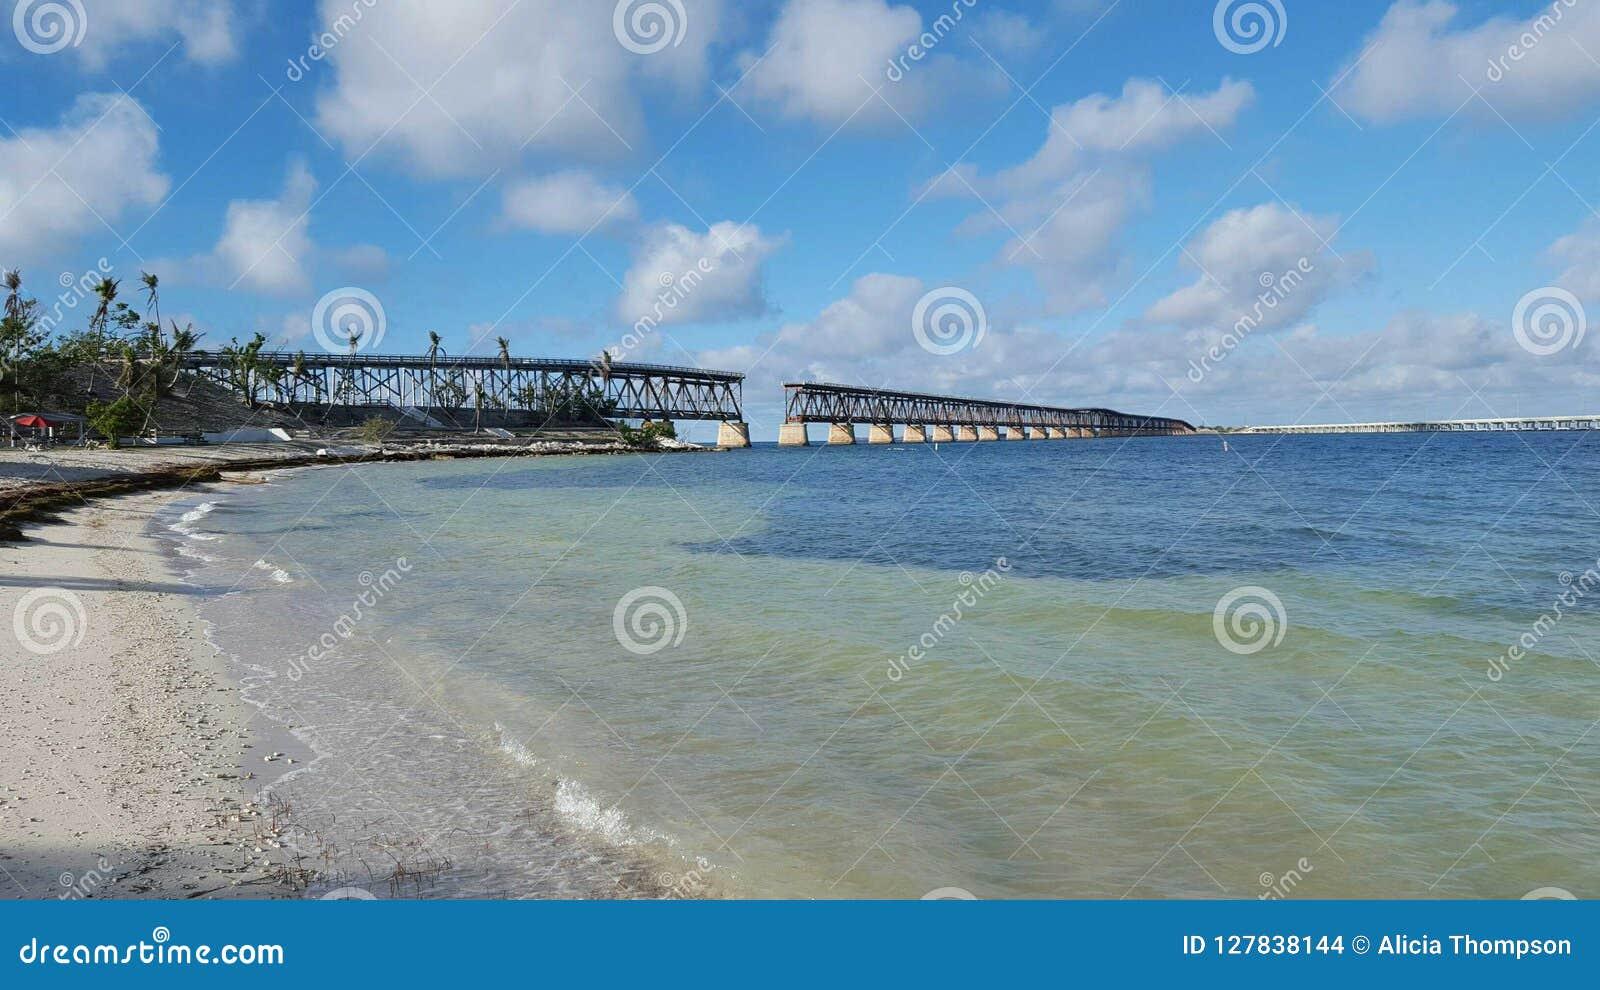 Bahia Honda Bridge